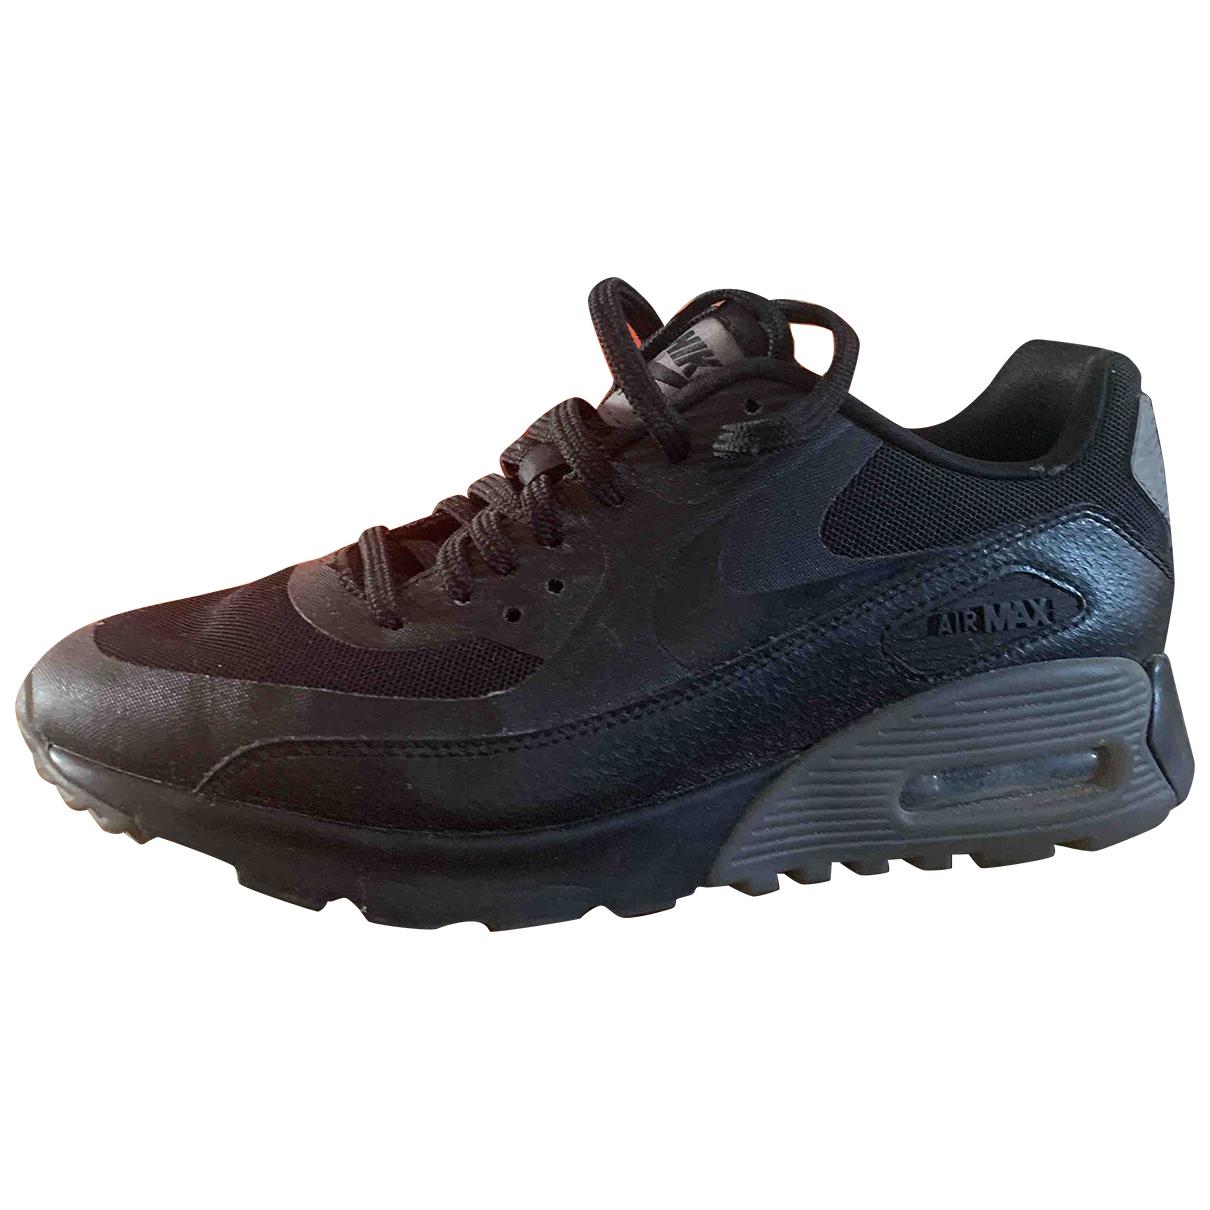 Nike Air Max 90 Black Cloth Trainers for Women 37.5 EU